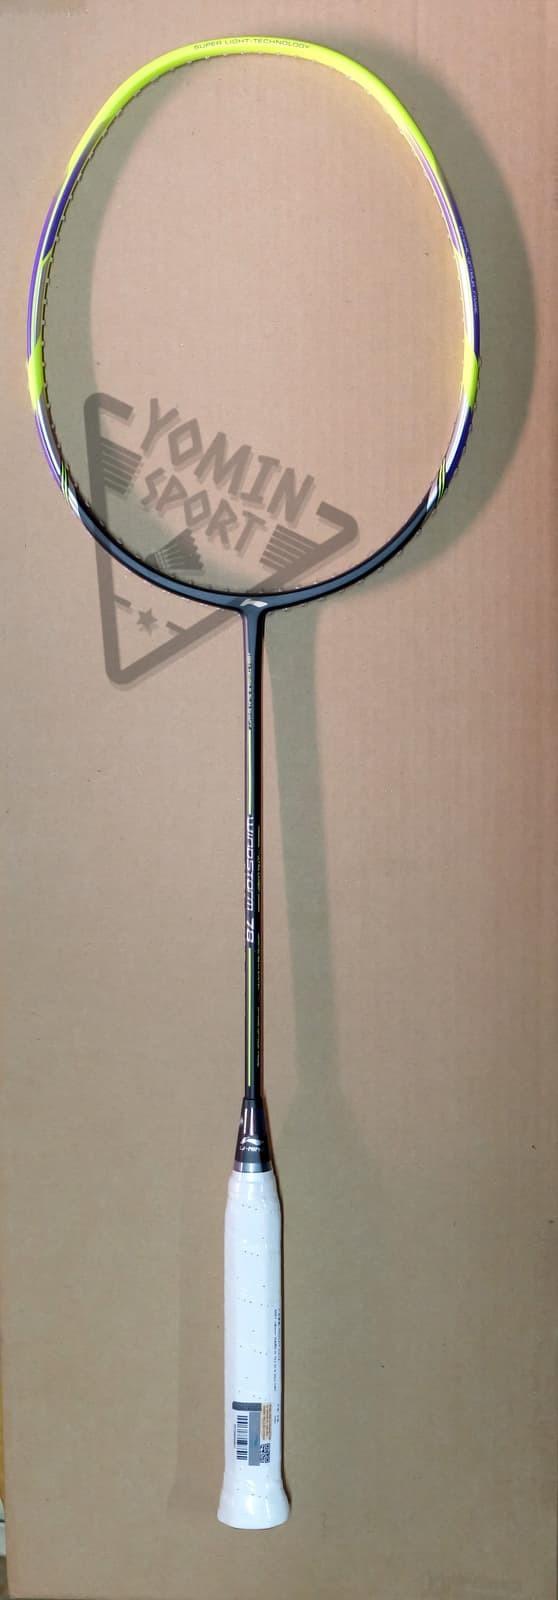 harga Raket badminton windstorm 78 ( black / lime ) Tokopedia.com